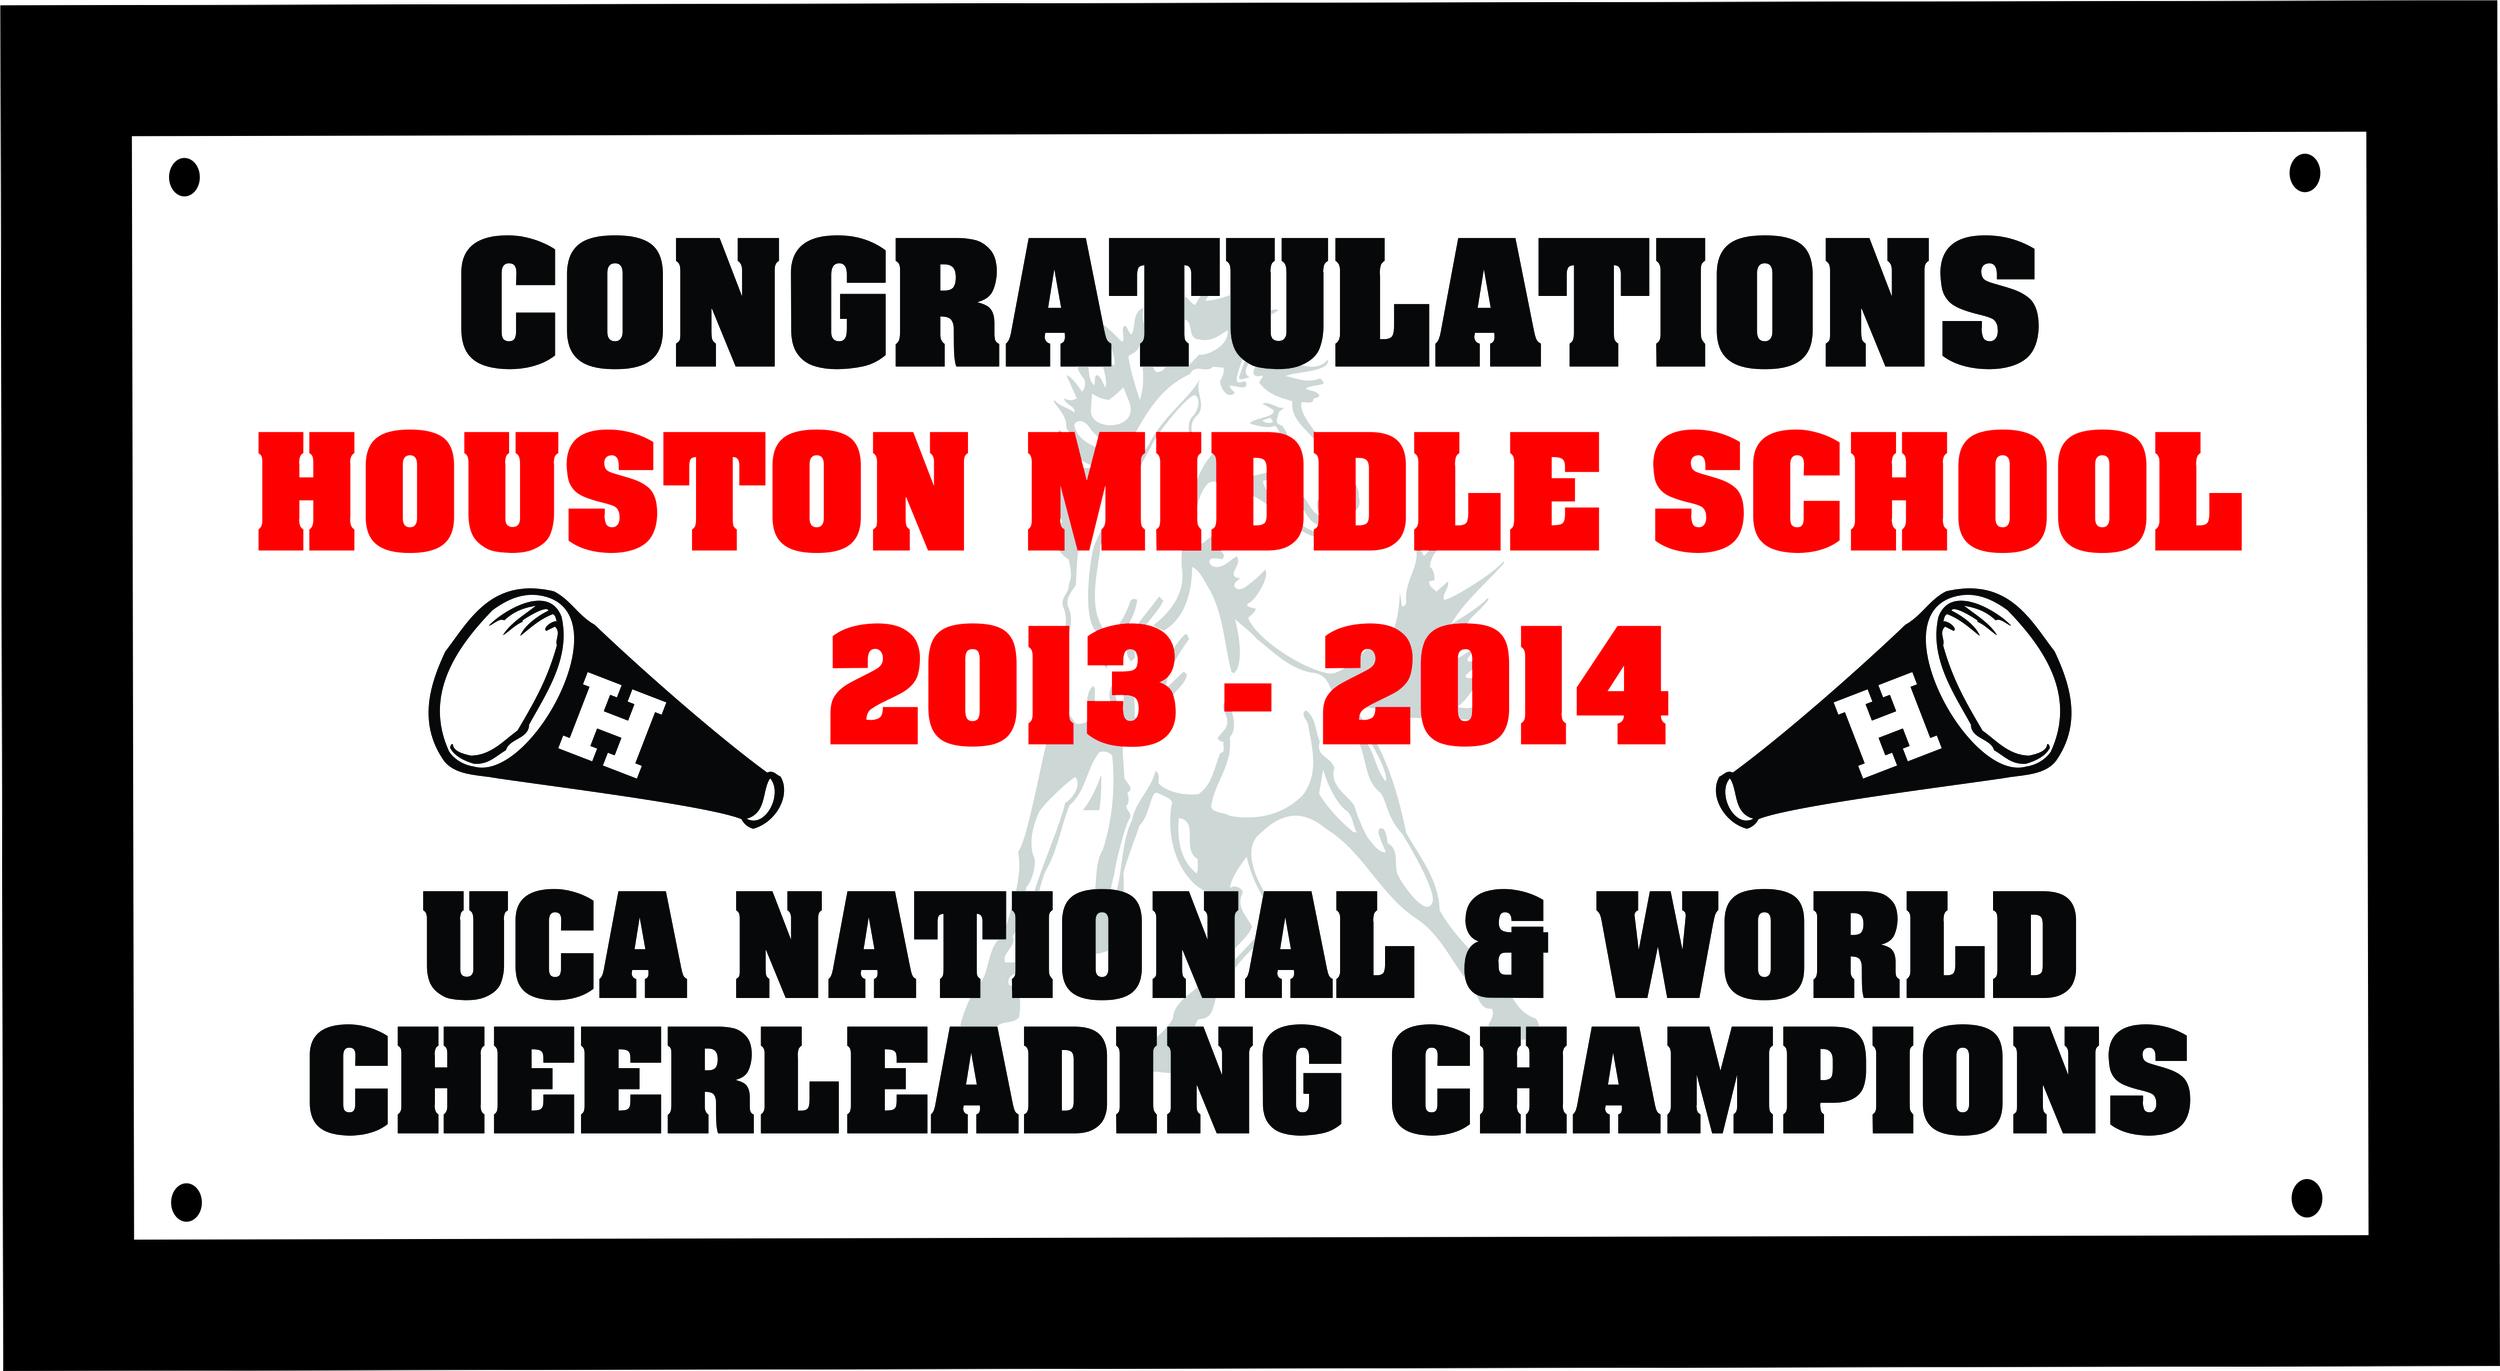 Houston Middle School 3x6 Digital Banner